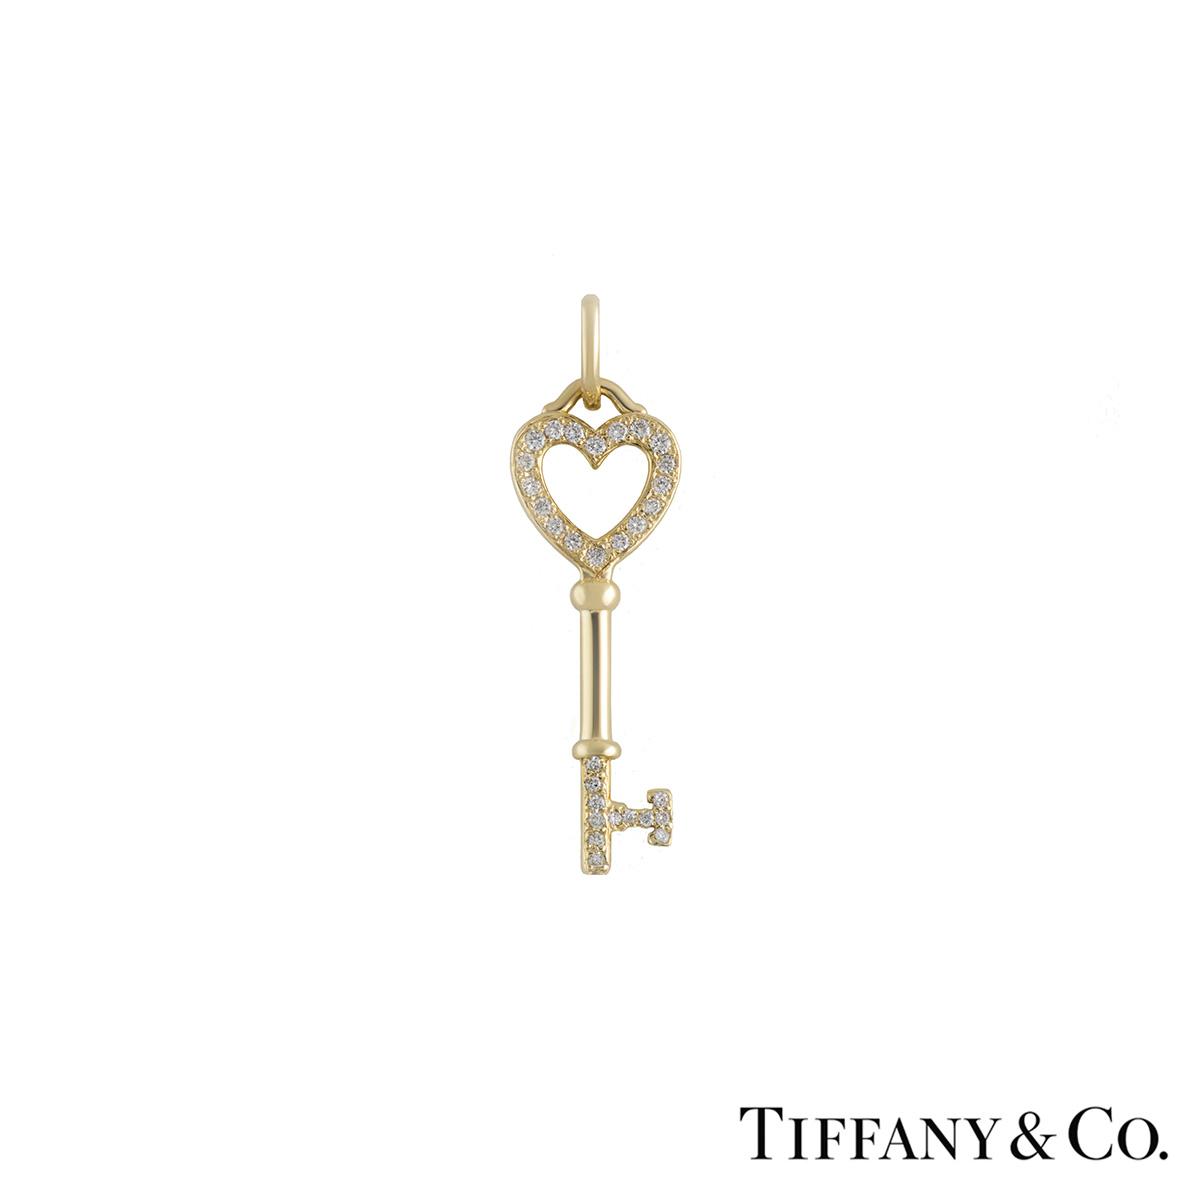 Tiffany & Co. 18k Yellow Gold Diamond Set Heart Key Pendant